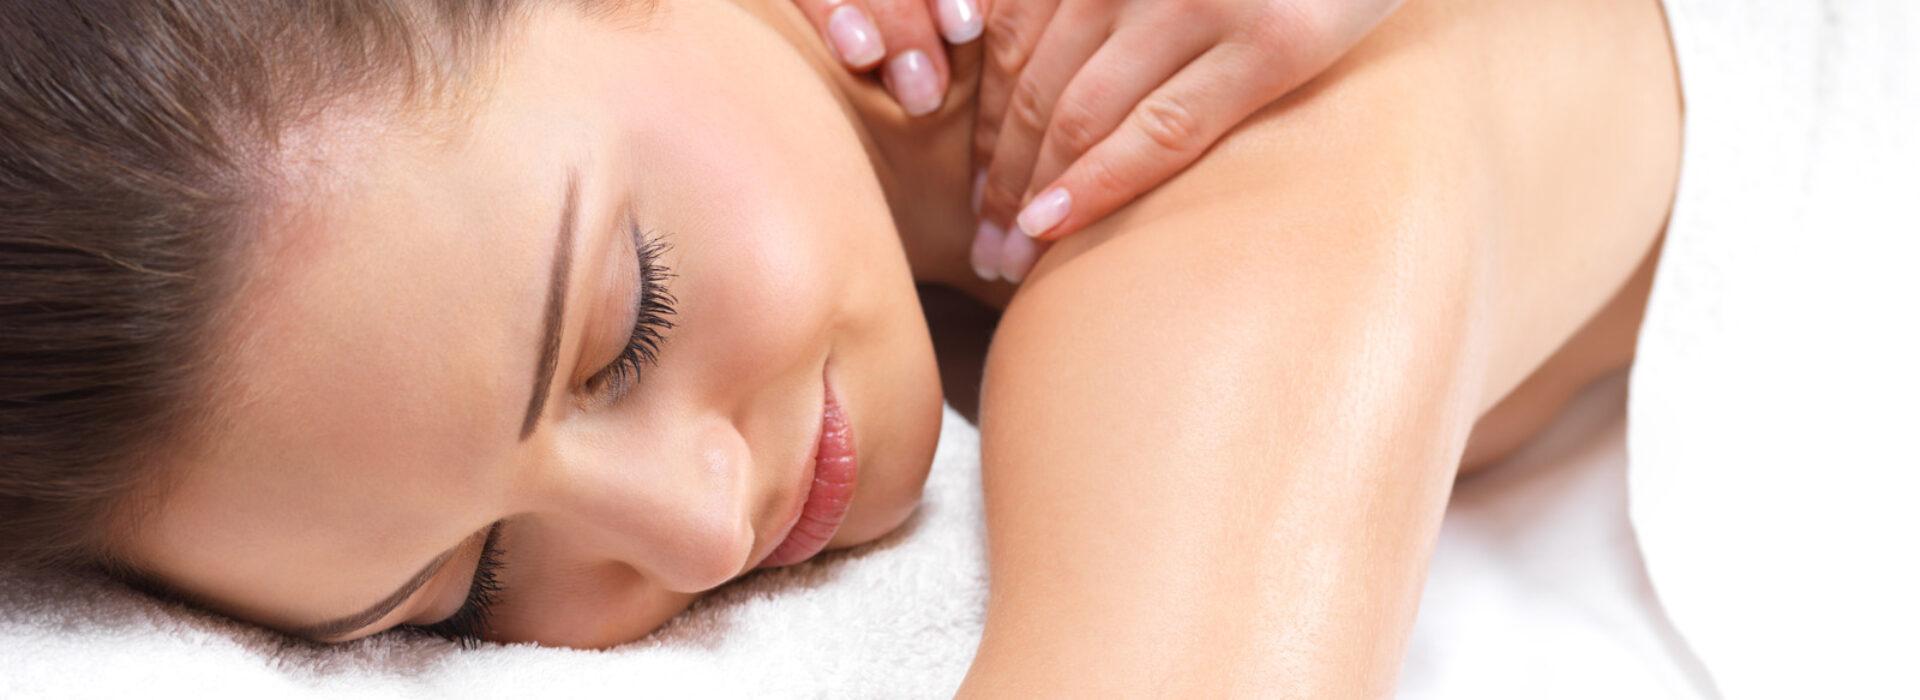 Taastrup massage